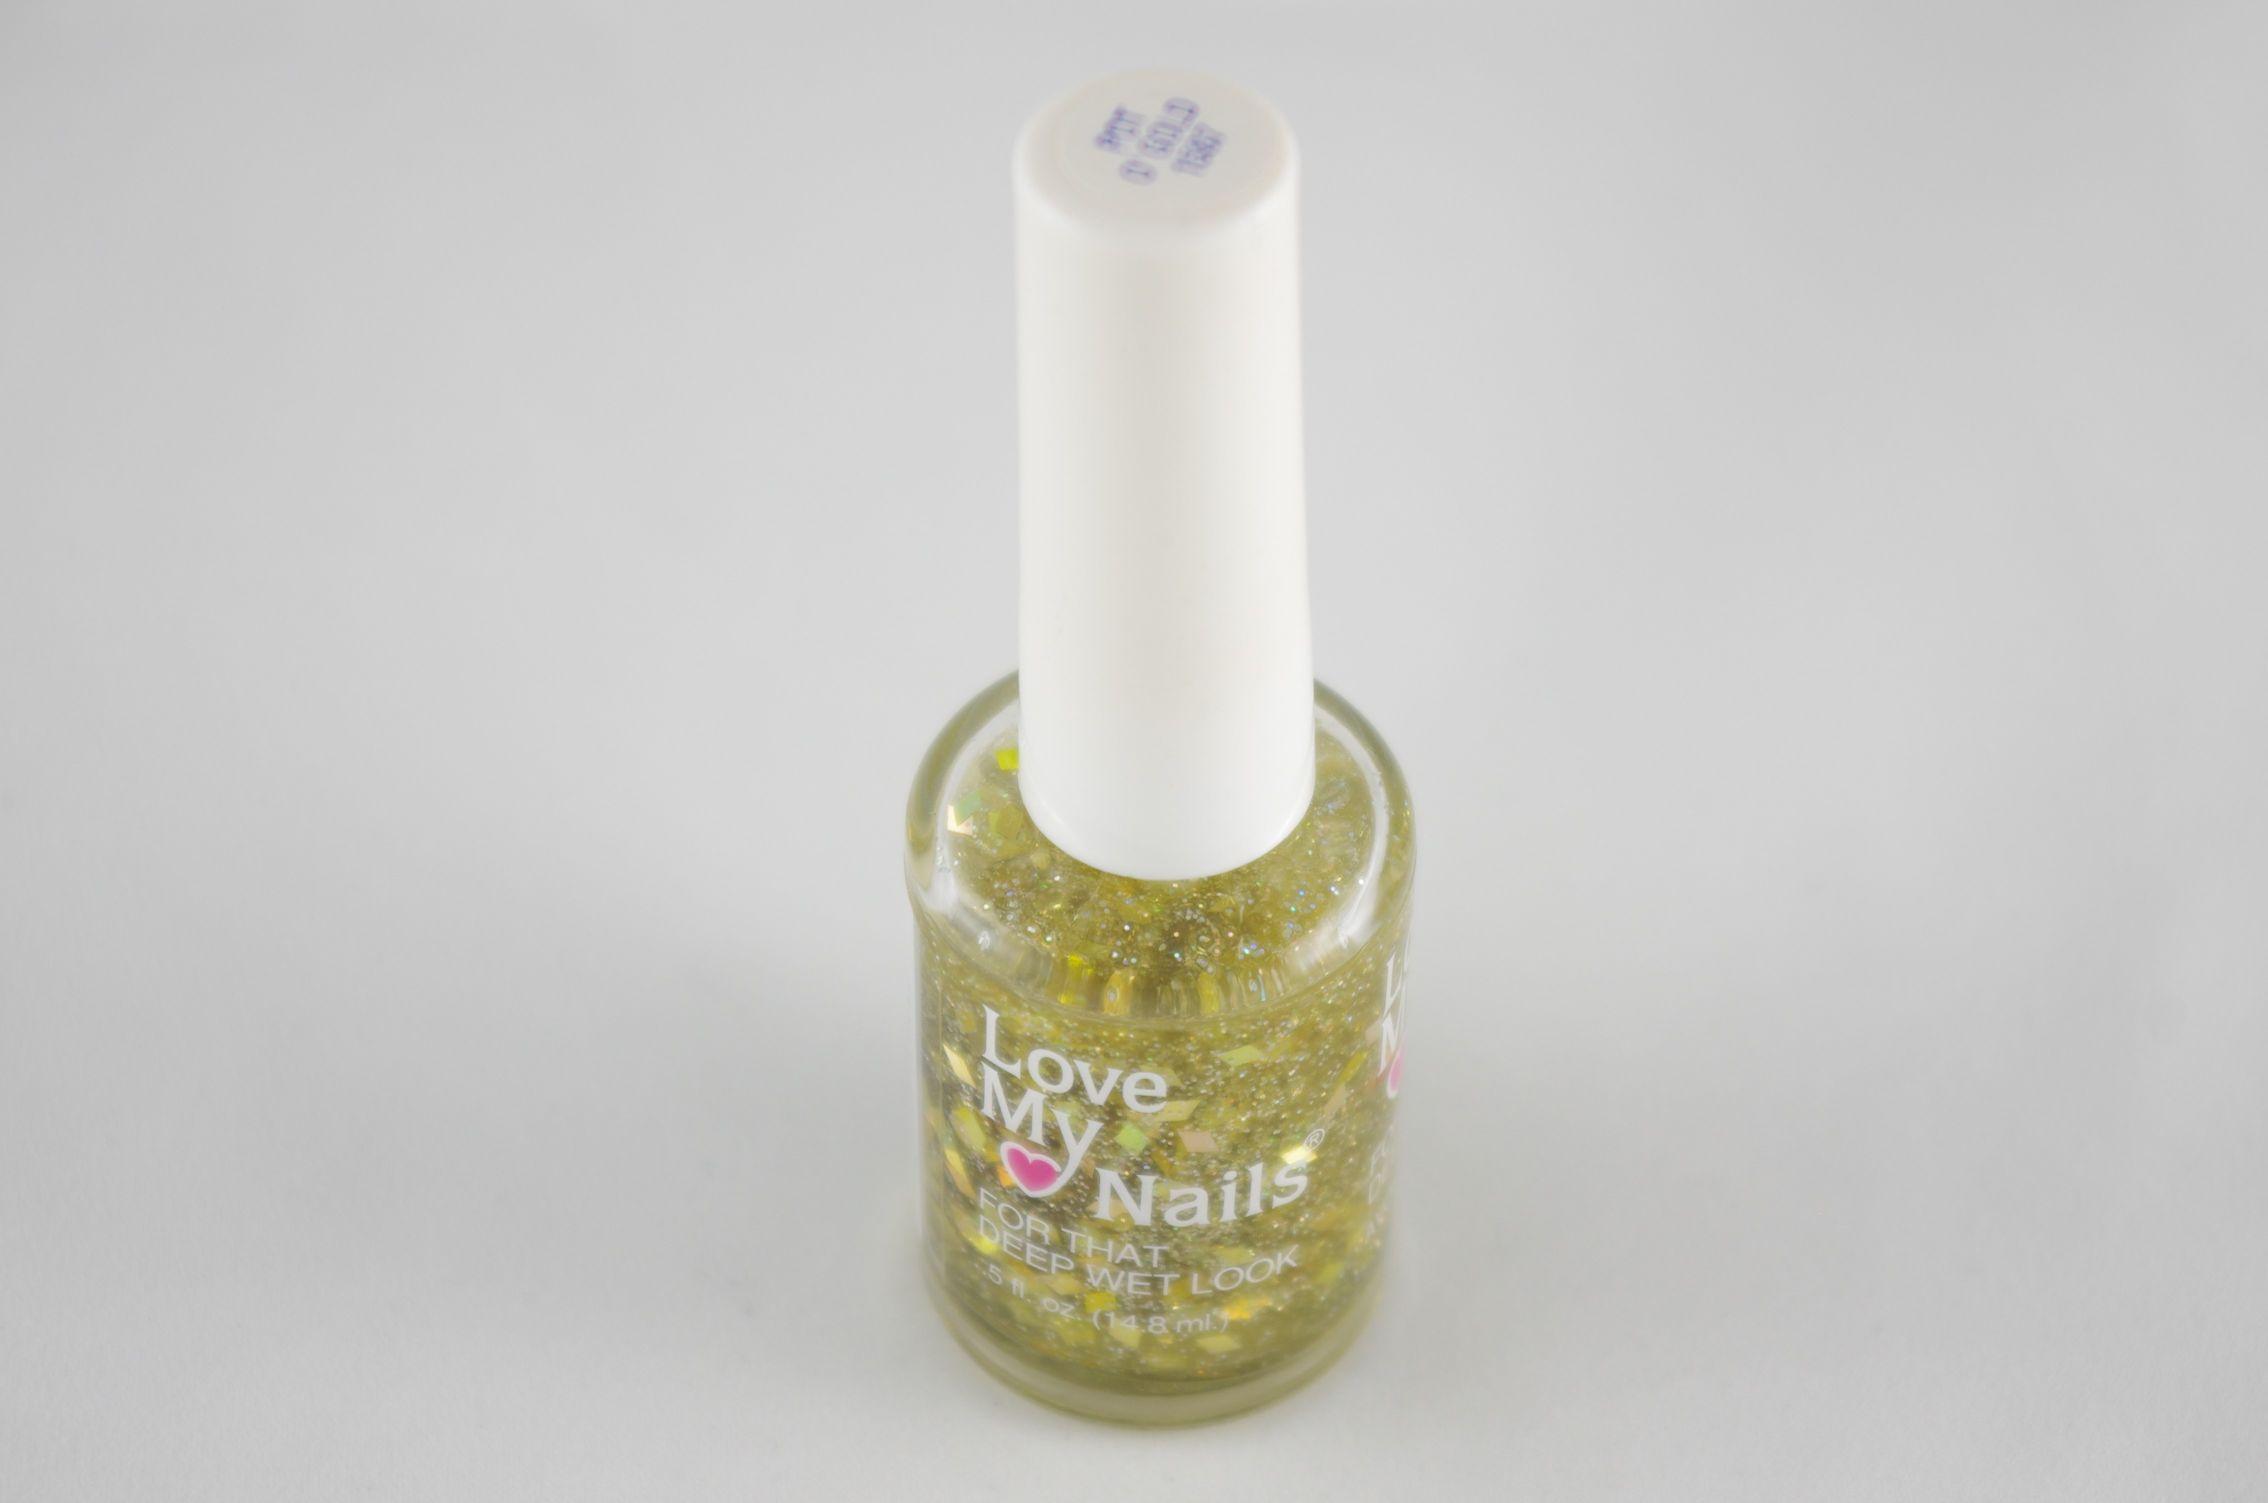 Love My Nails deep wet look Pot o Gold - Salon Cosmetic